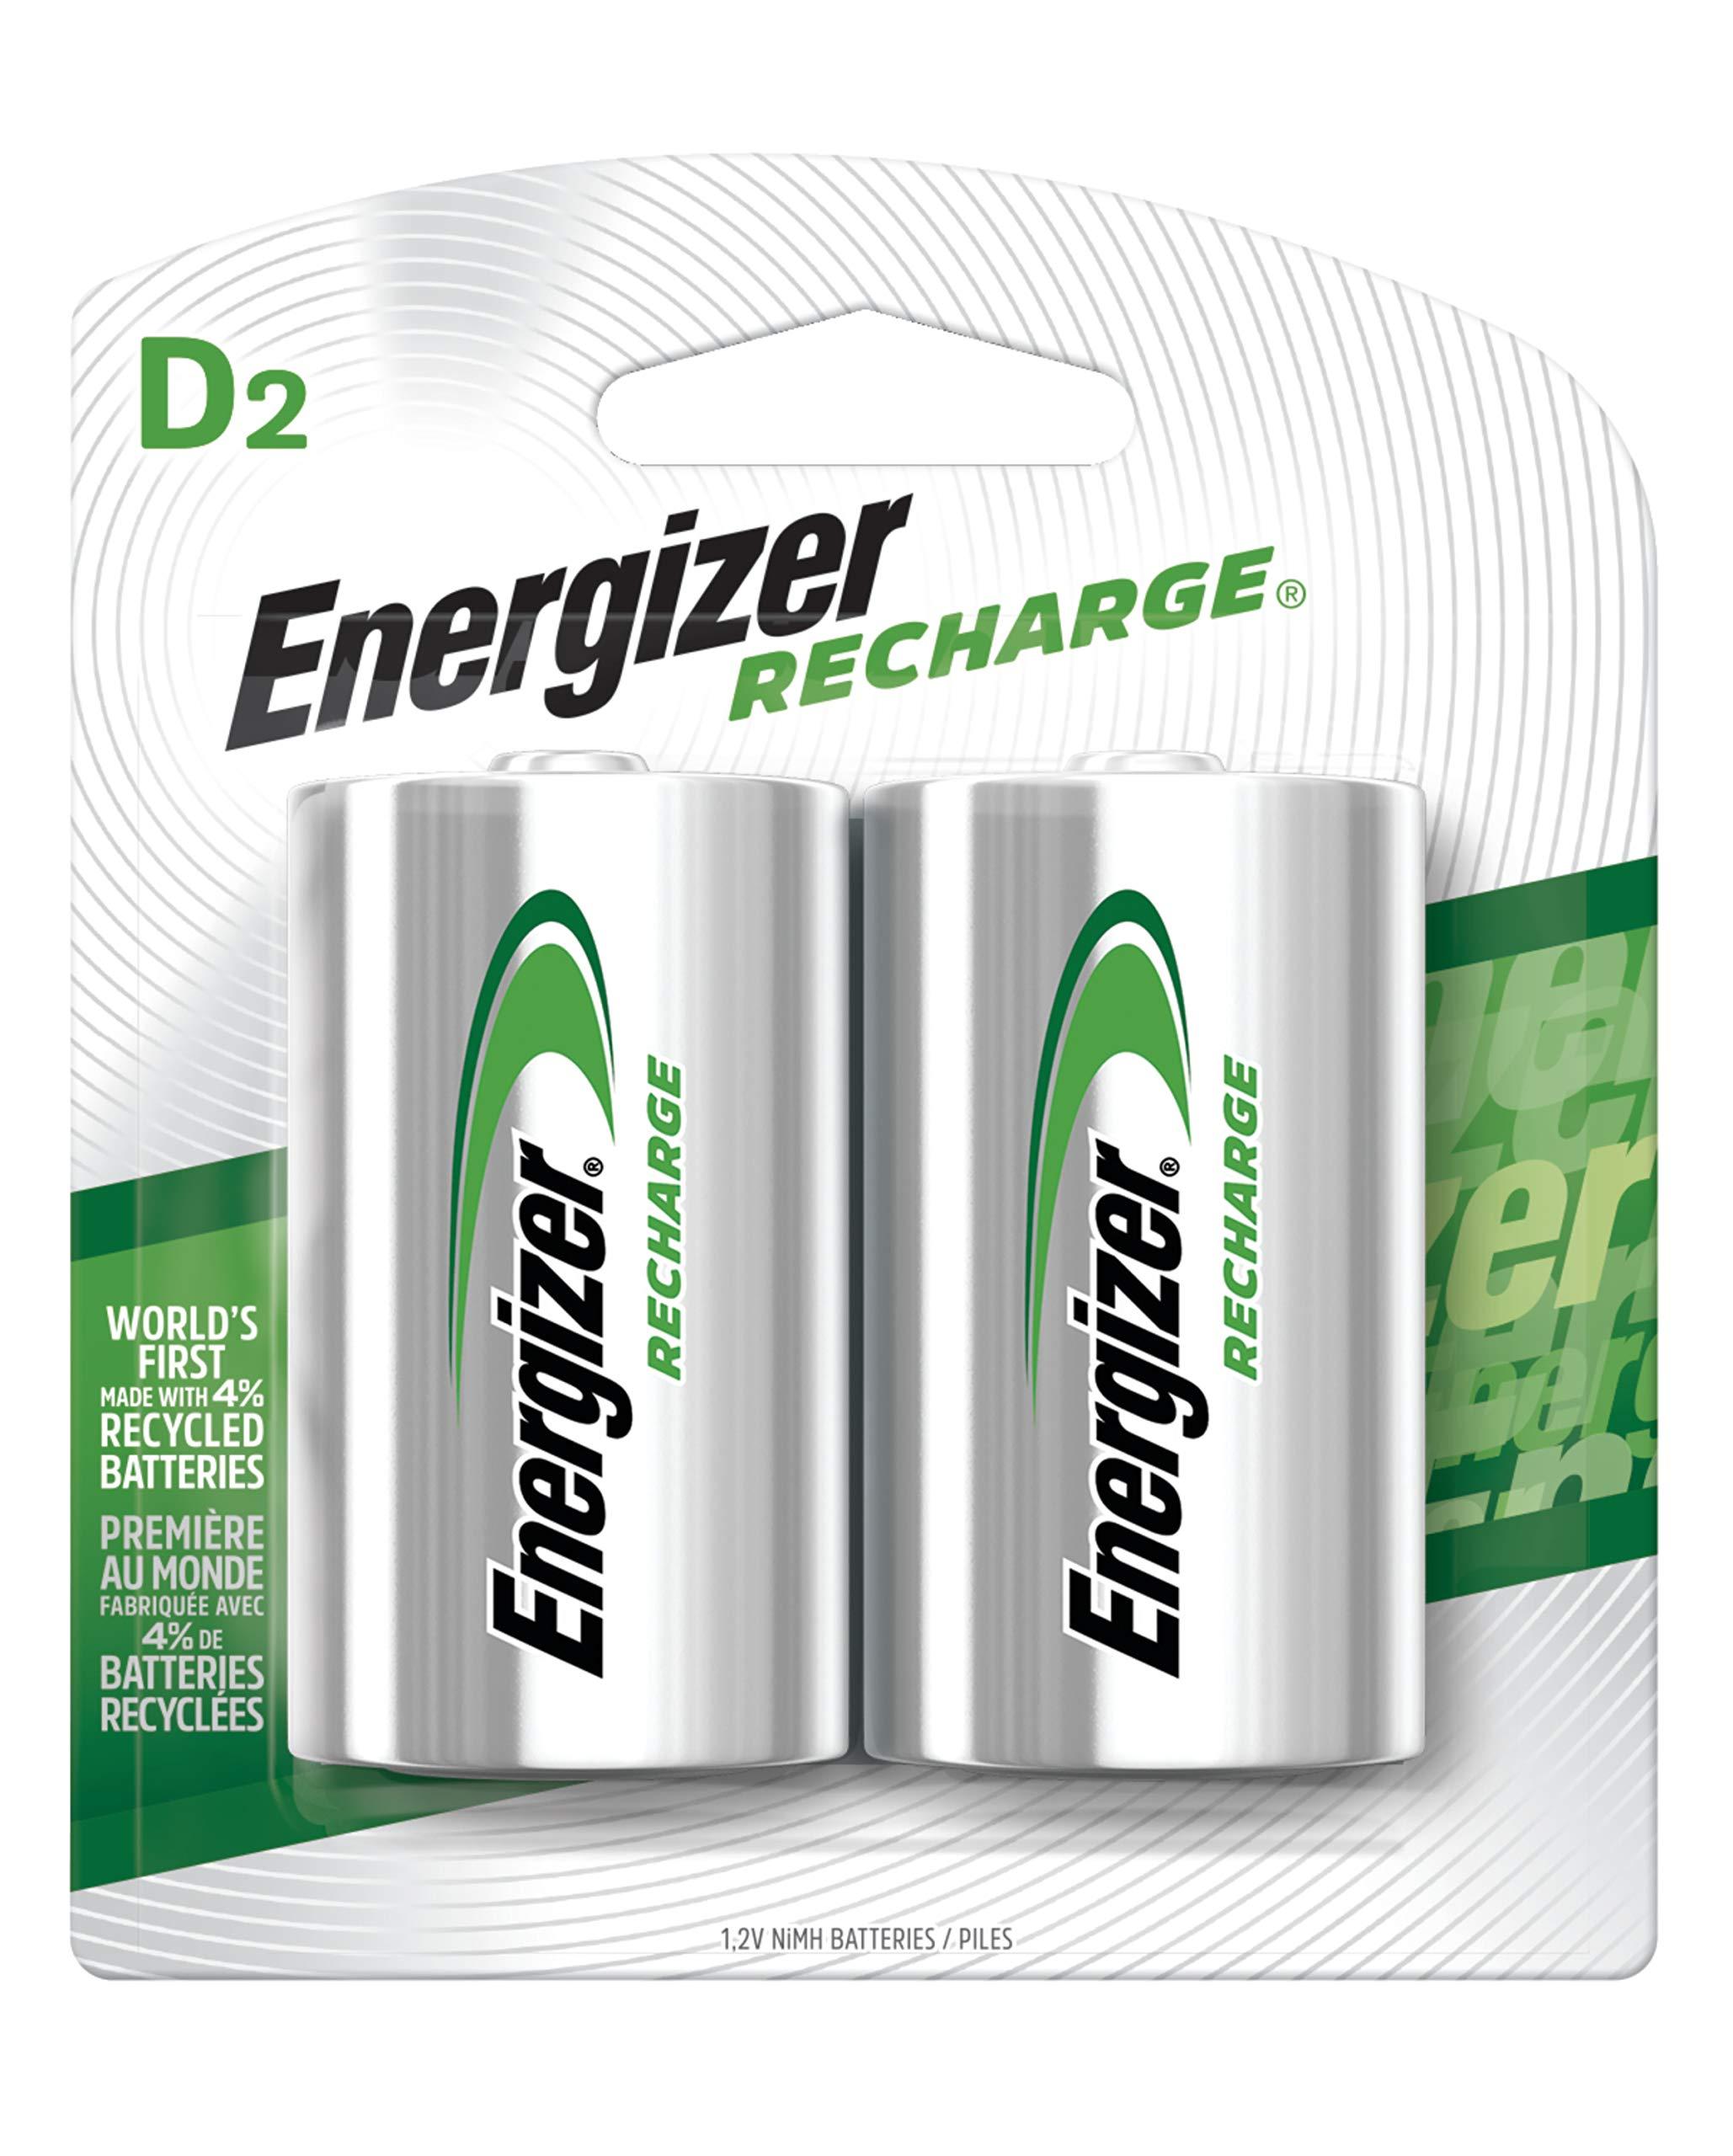 Energizer Rechargeable Batteries NiMH 2500 count